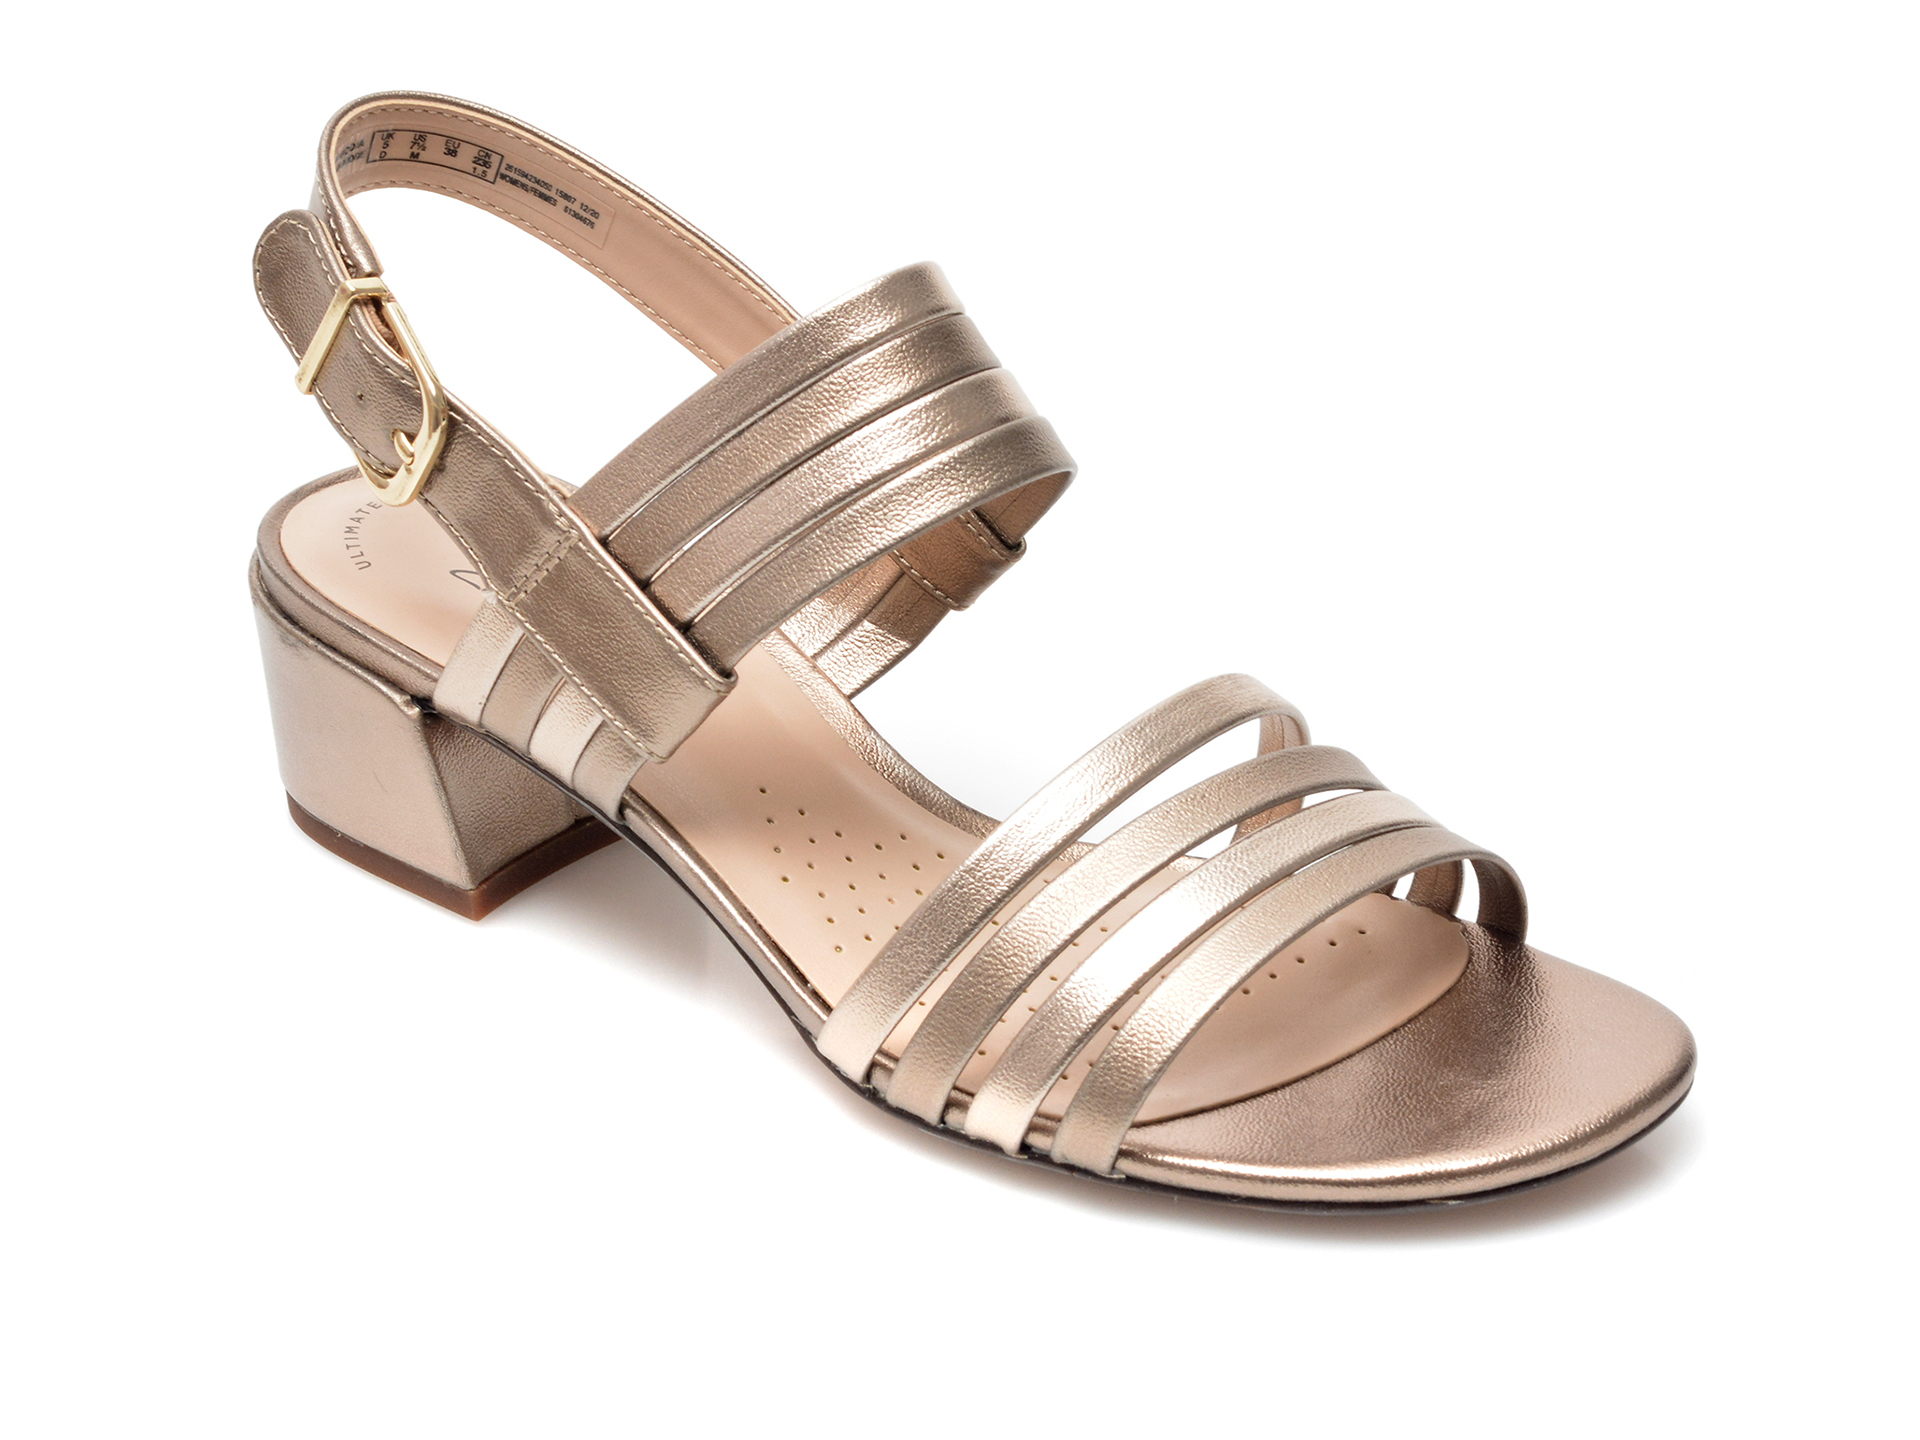 Sandale CLARKS aurii, Caroleigh Bess, din piele ecologica imagine otter.ro 2021